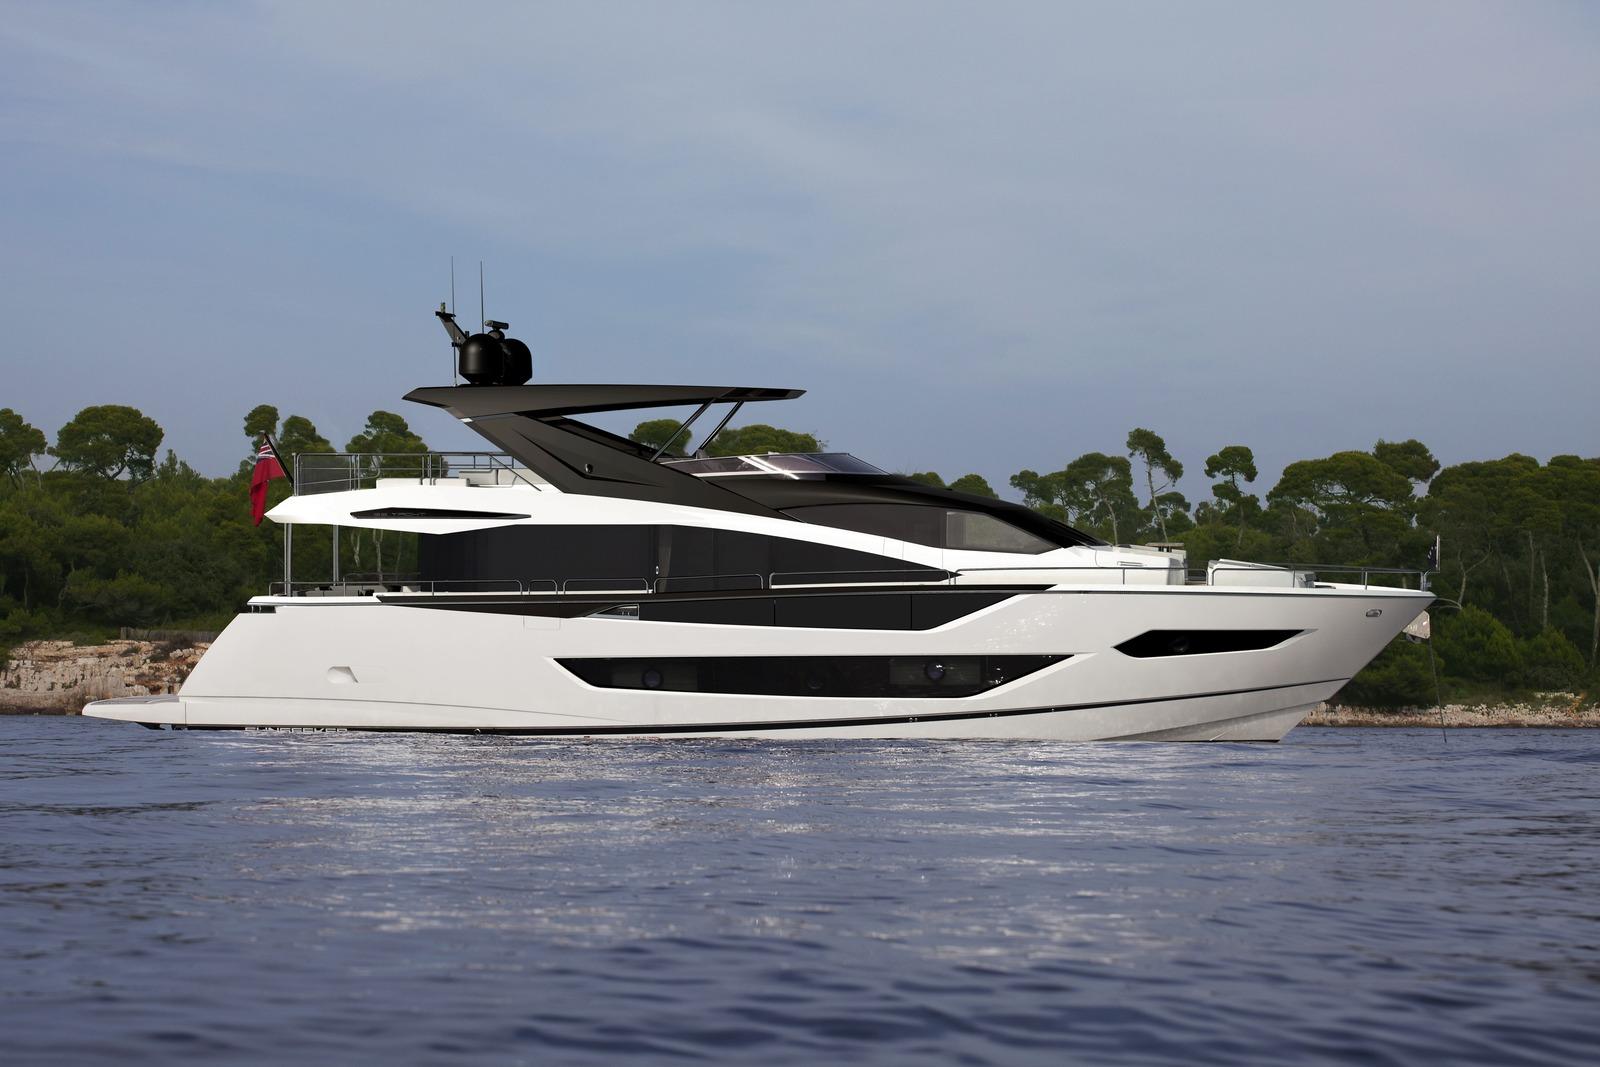 Sunseeker 88 Yacht - boat shopping